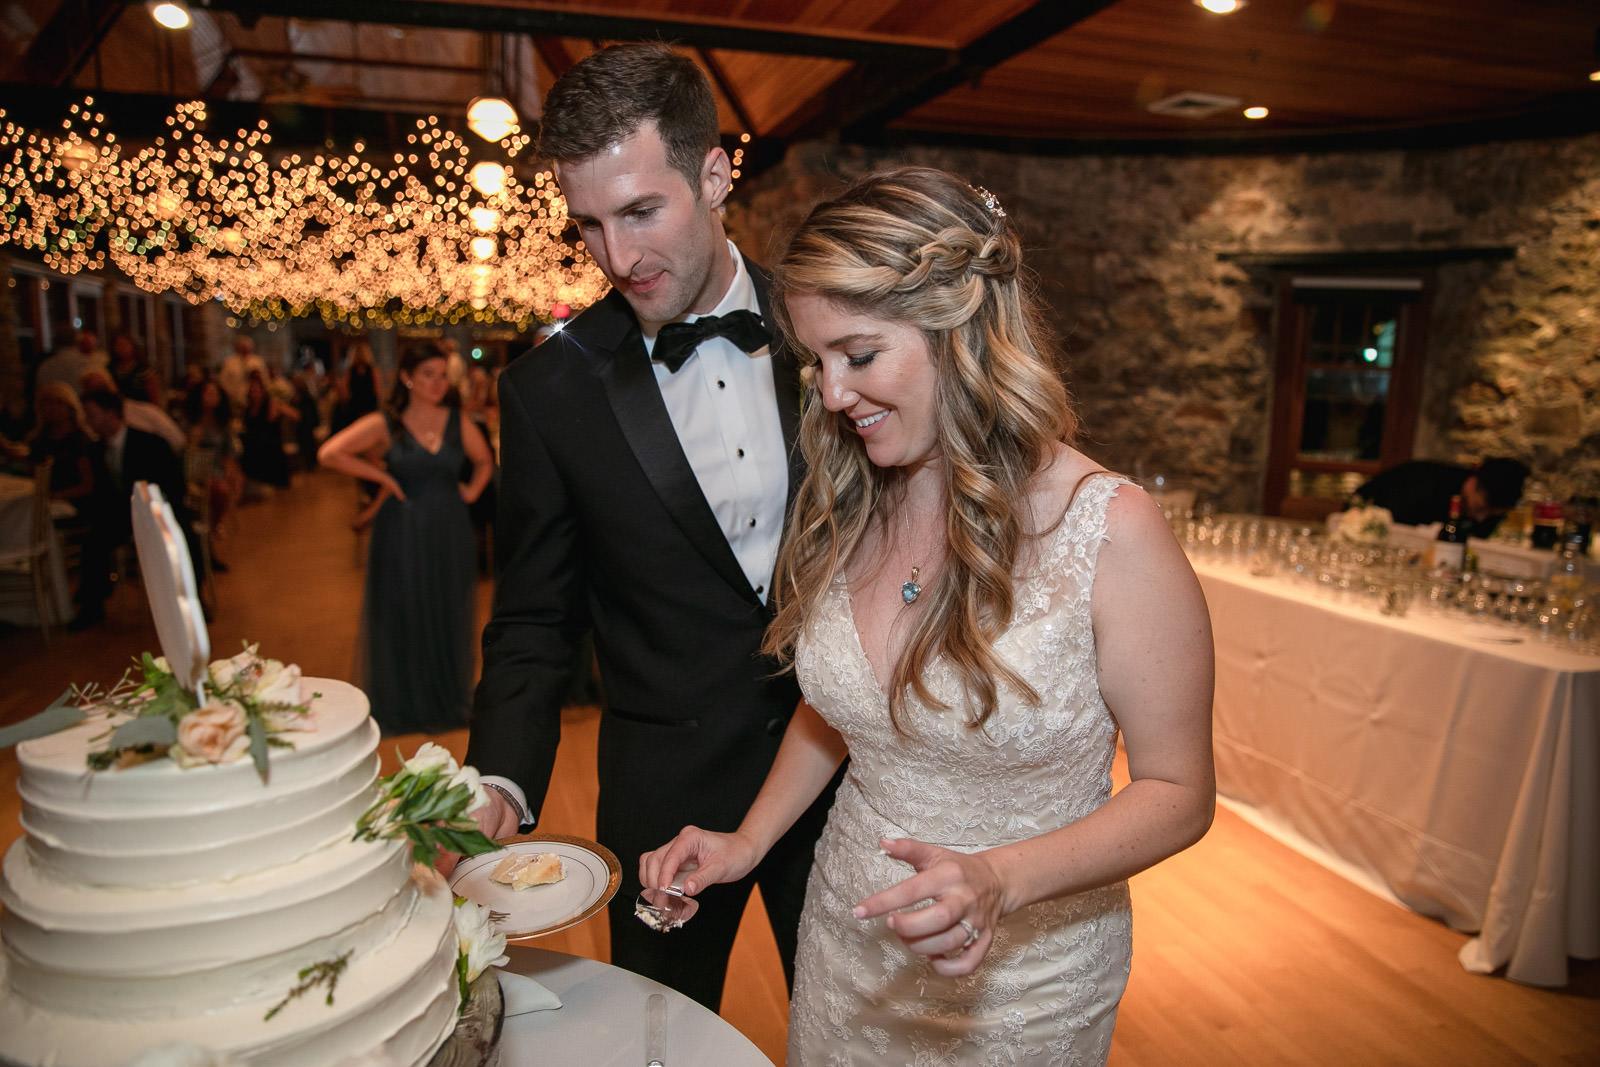 Wedding, Narragansett Towers, The Towers, Narragansett, Rhode Island, RI, Tracy Jenkins photography, RI wedding photographer, Rhode Island wedding photographer, cake cutting, wedding cake